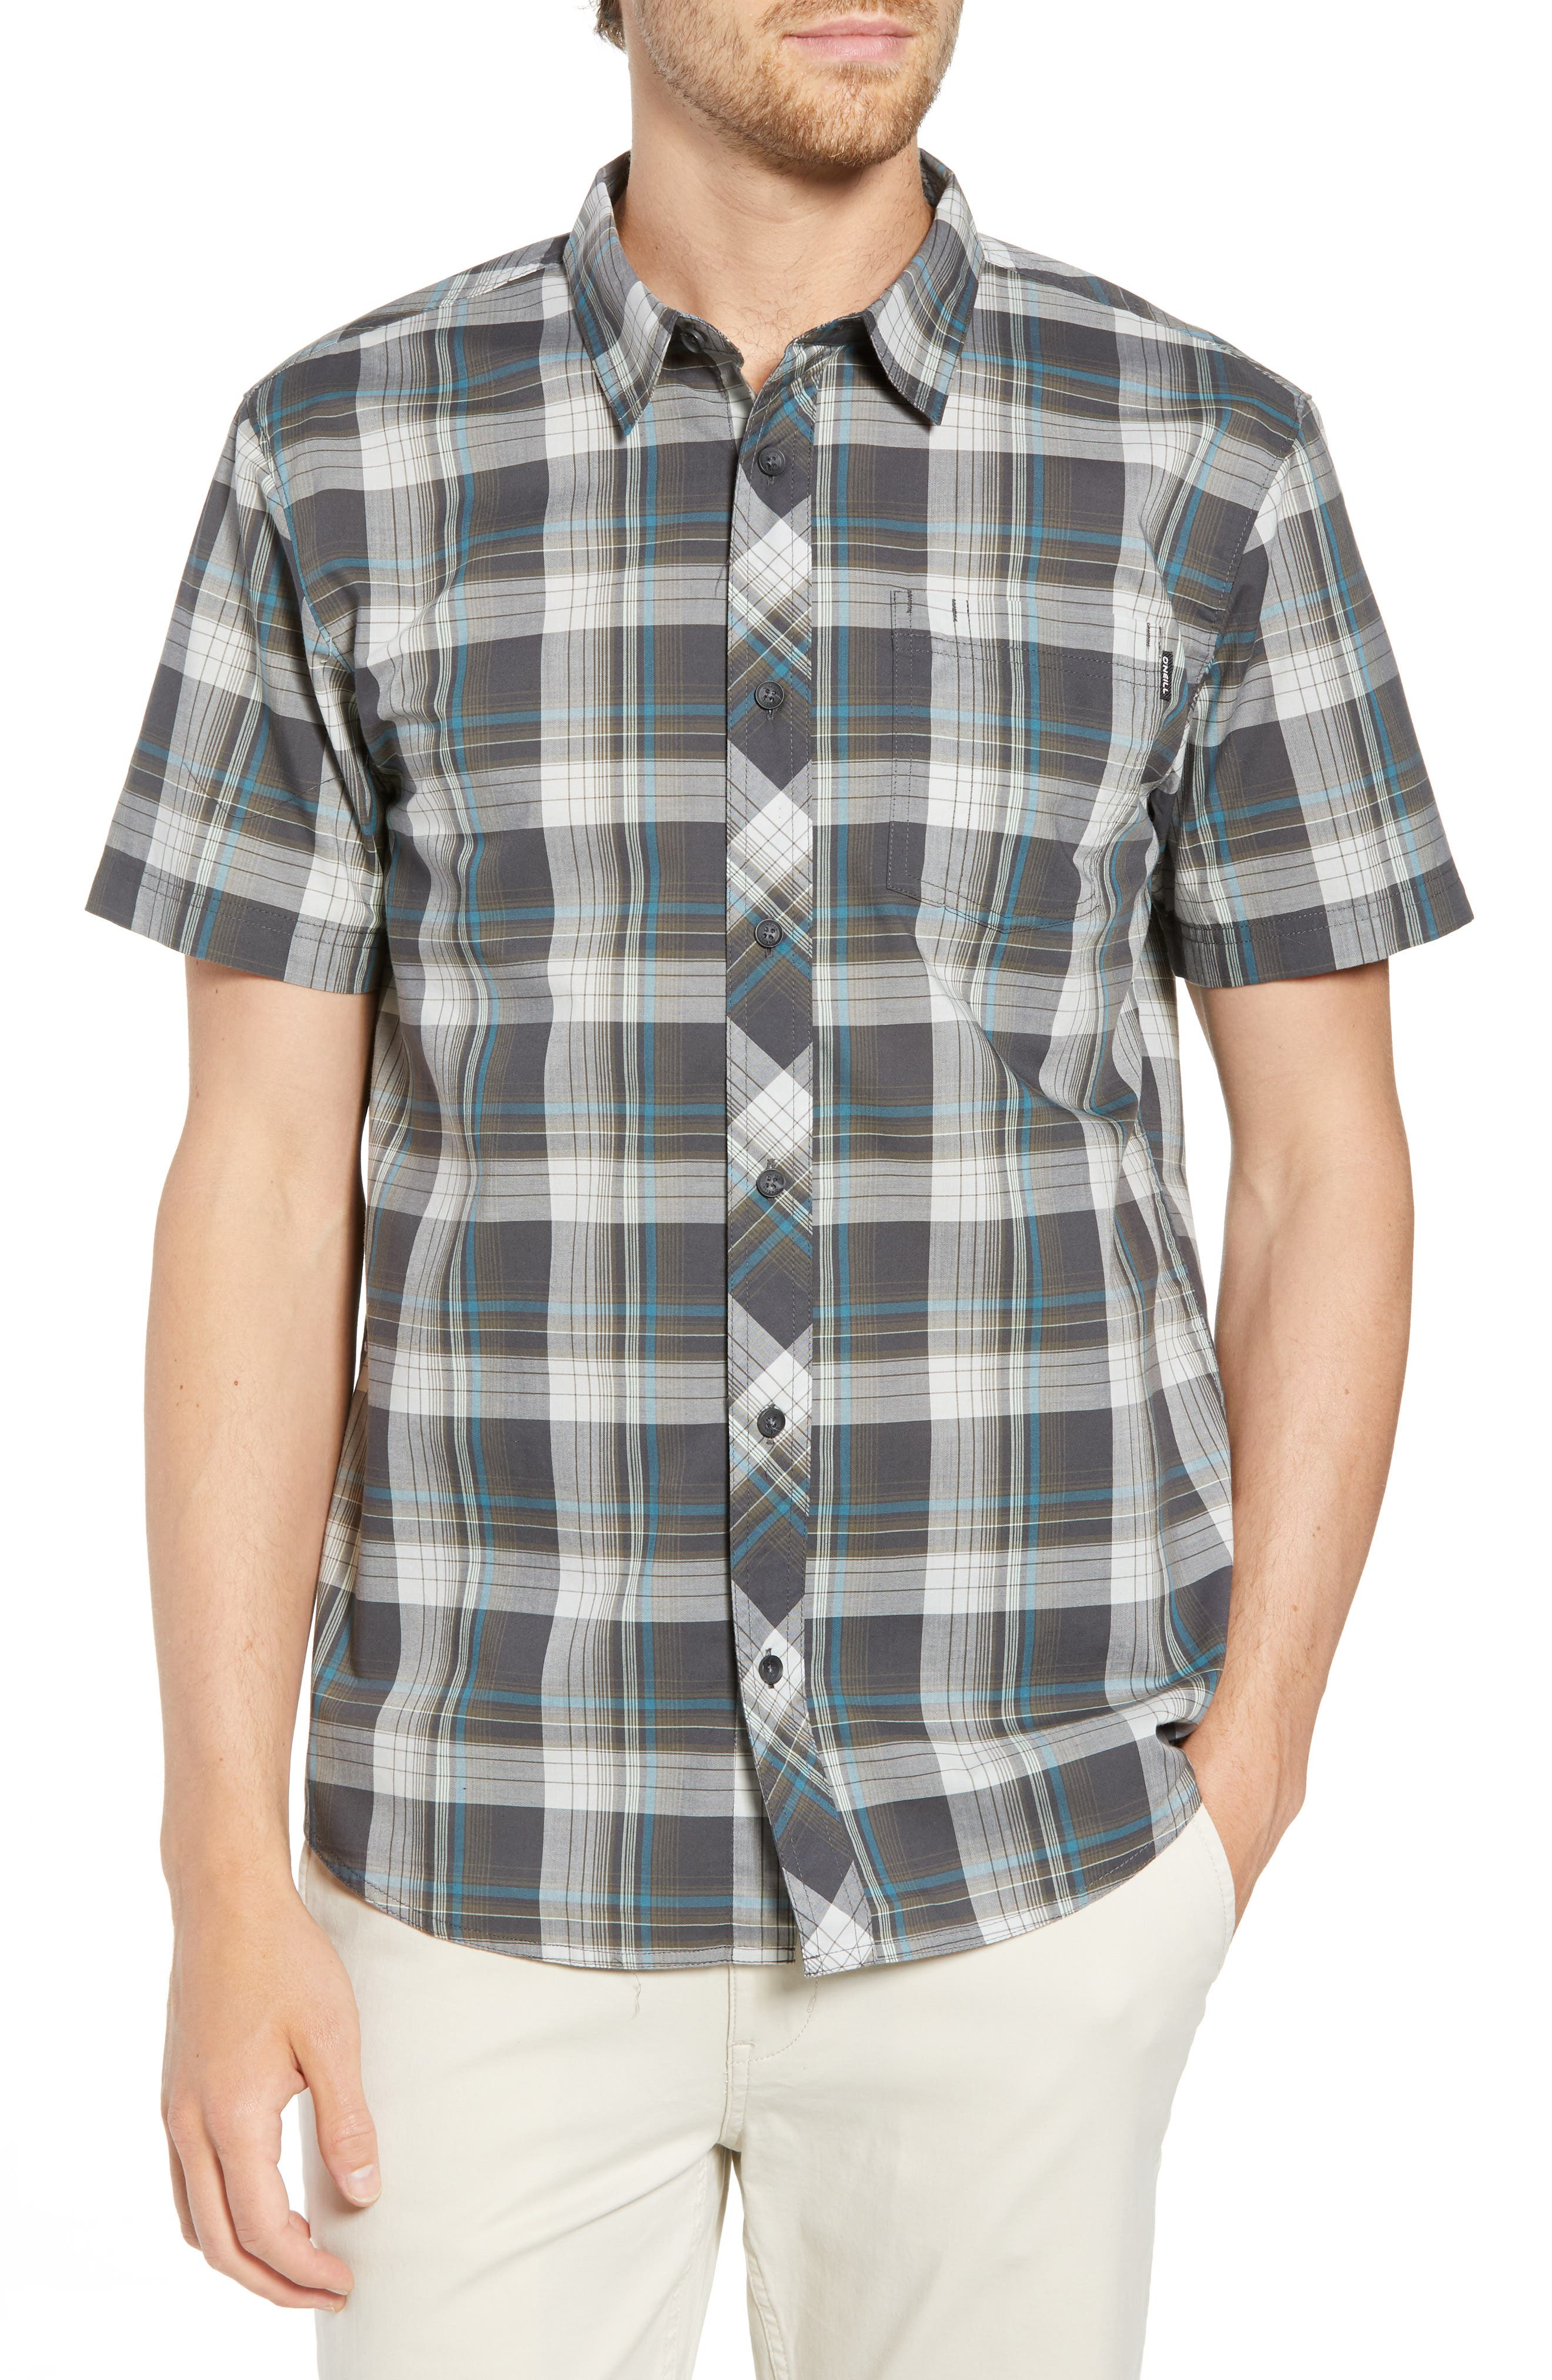 Gentry Short Sleeve Shirt,                         Main,                         color, Asphalt